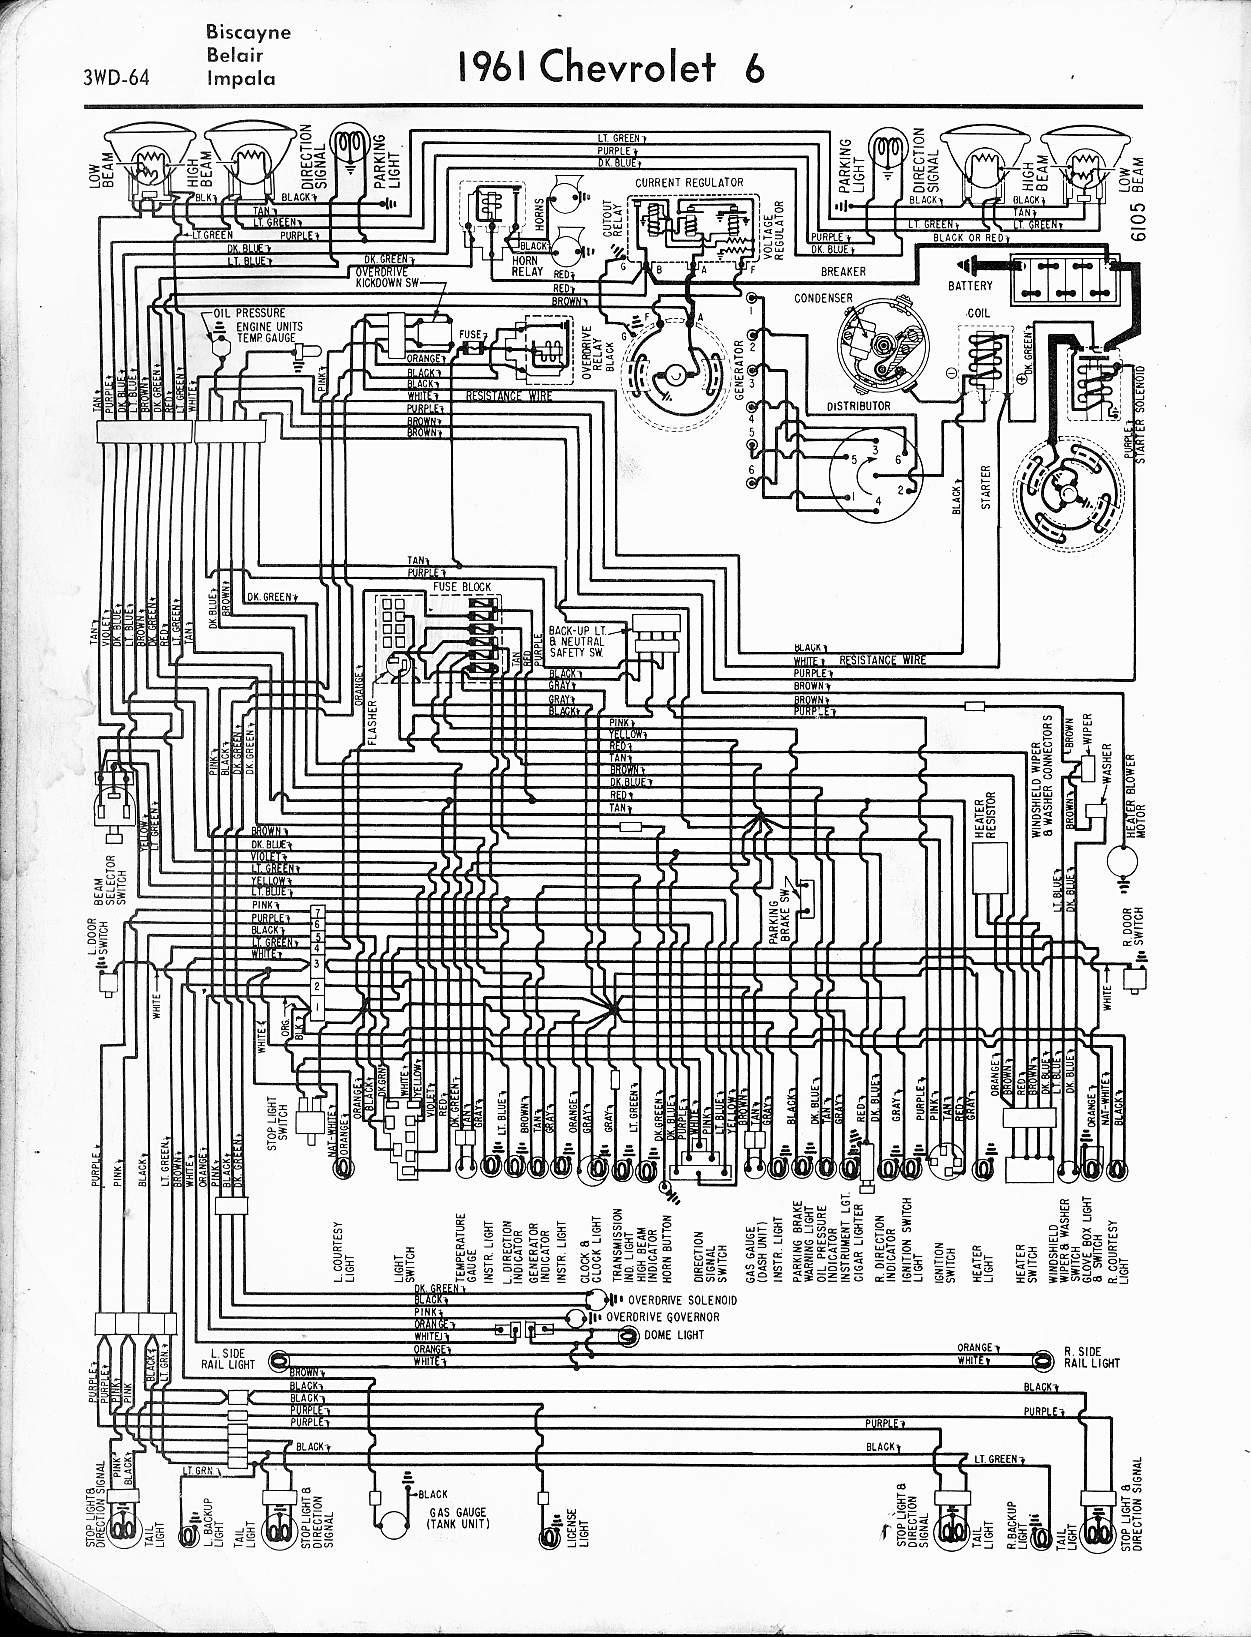 1965 impala wiring harness oc 9451  1960 chevy wiring diagram  oc 9451  1960 chevy wiring diagram